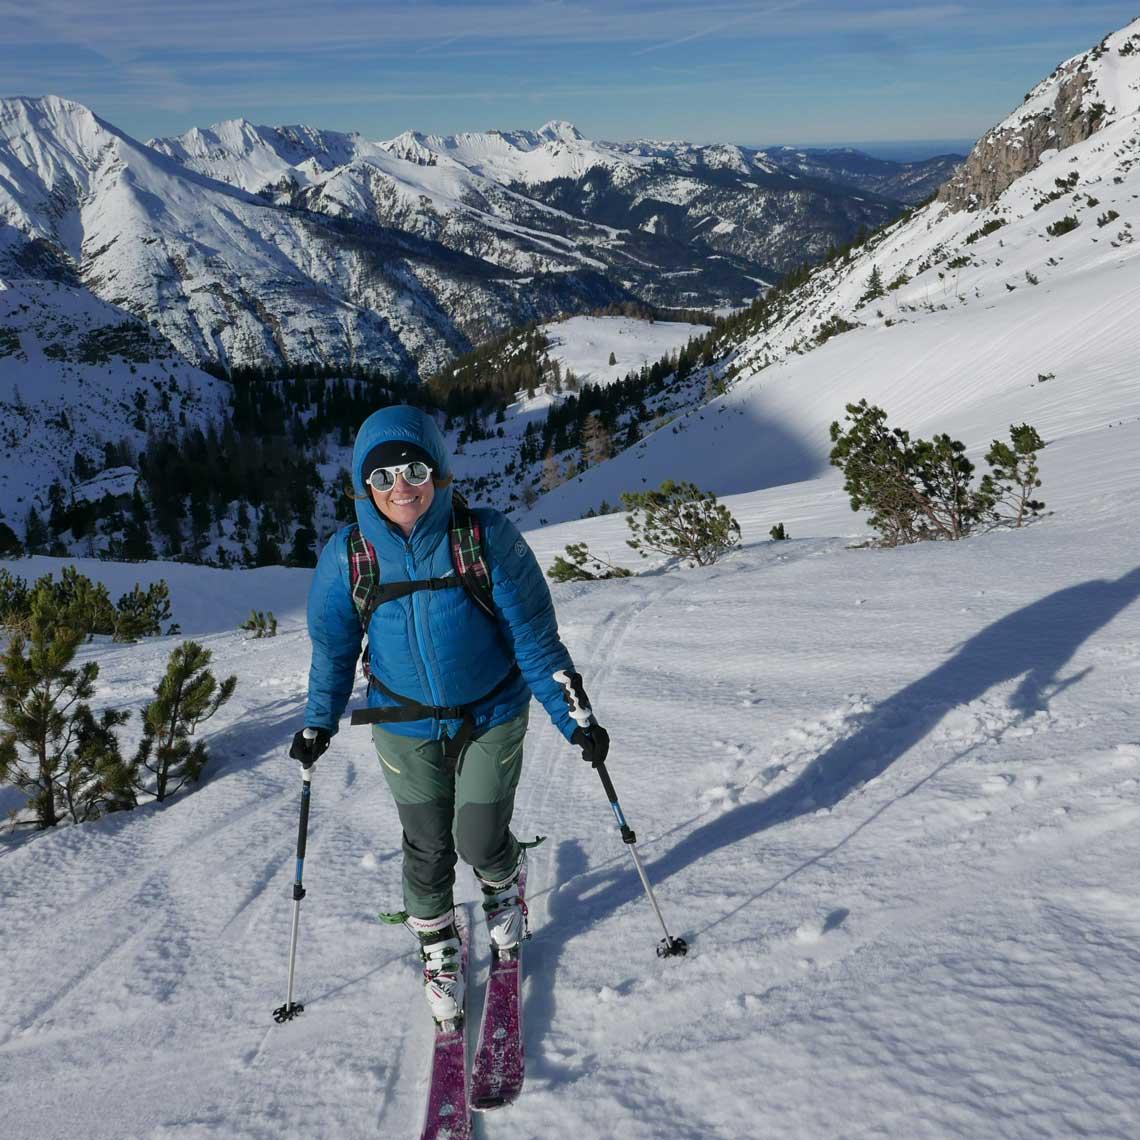 skitour-kotalm-aufstieg-aussicht-munichmountaingirls-tourenbericht-anja-woertge